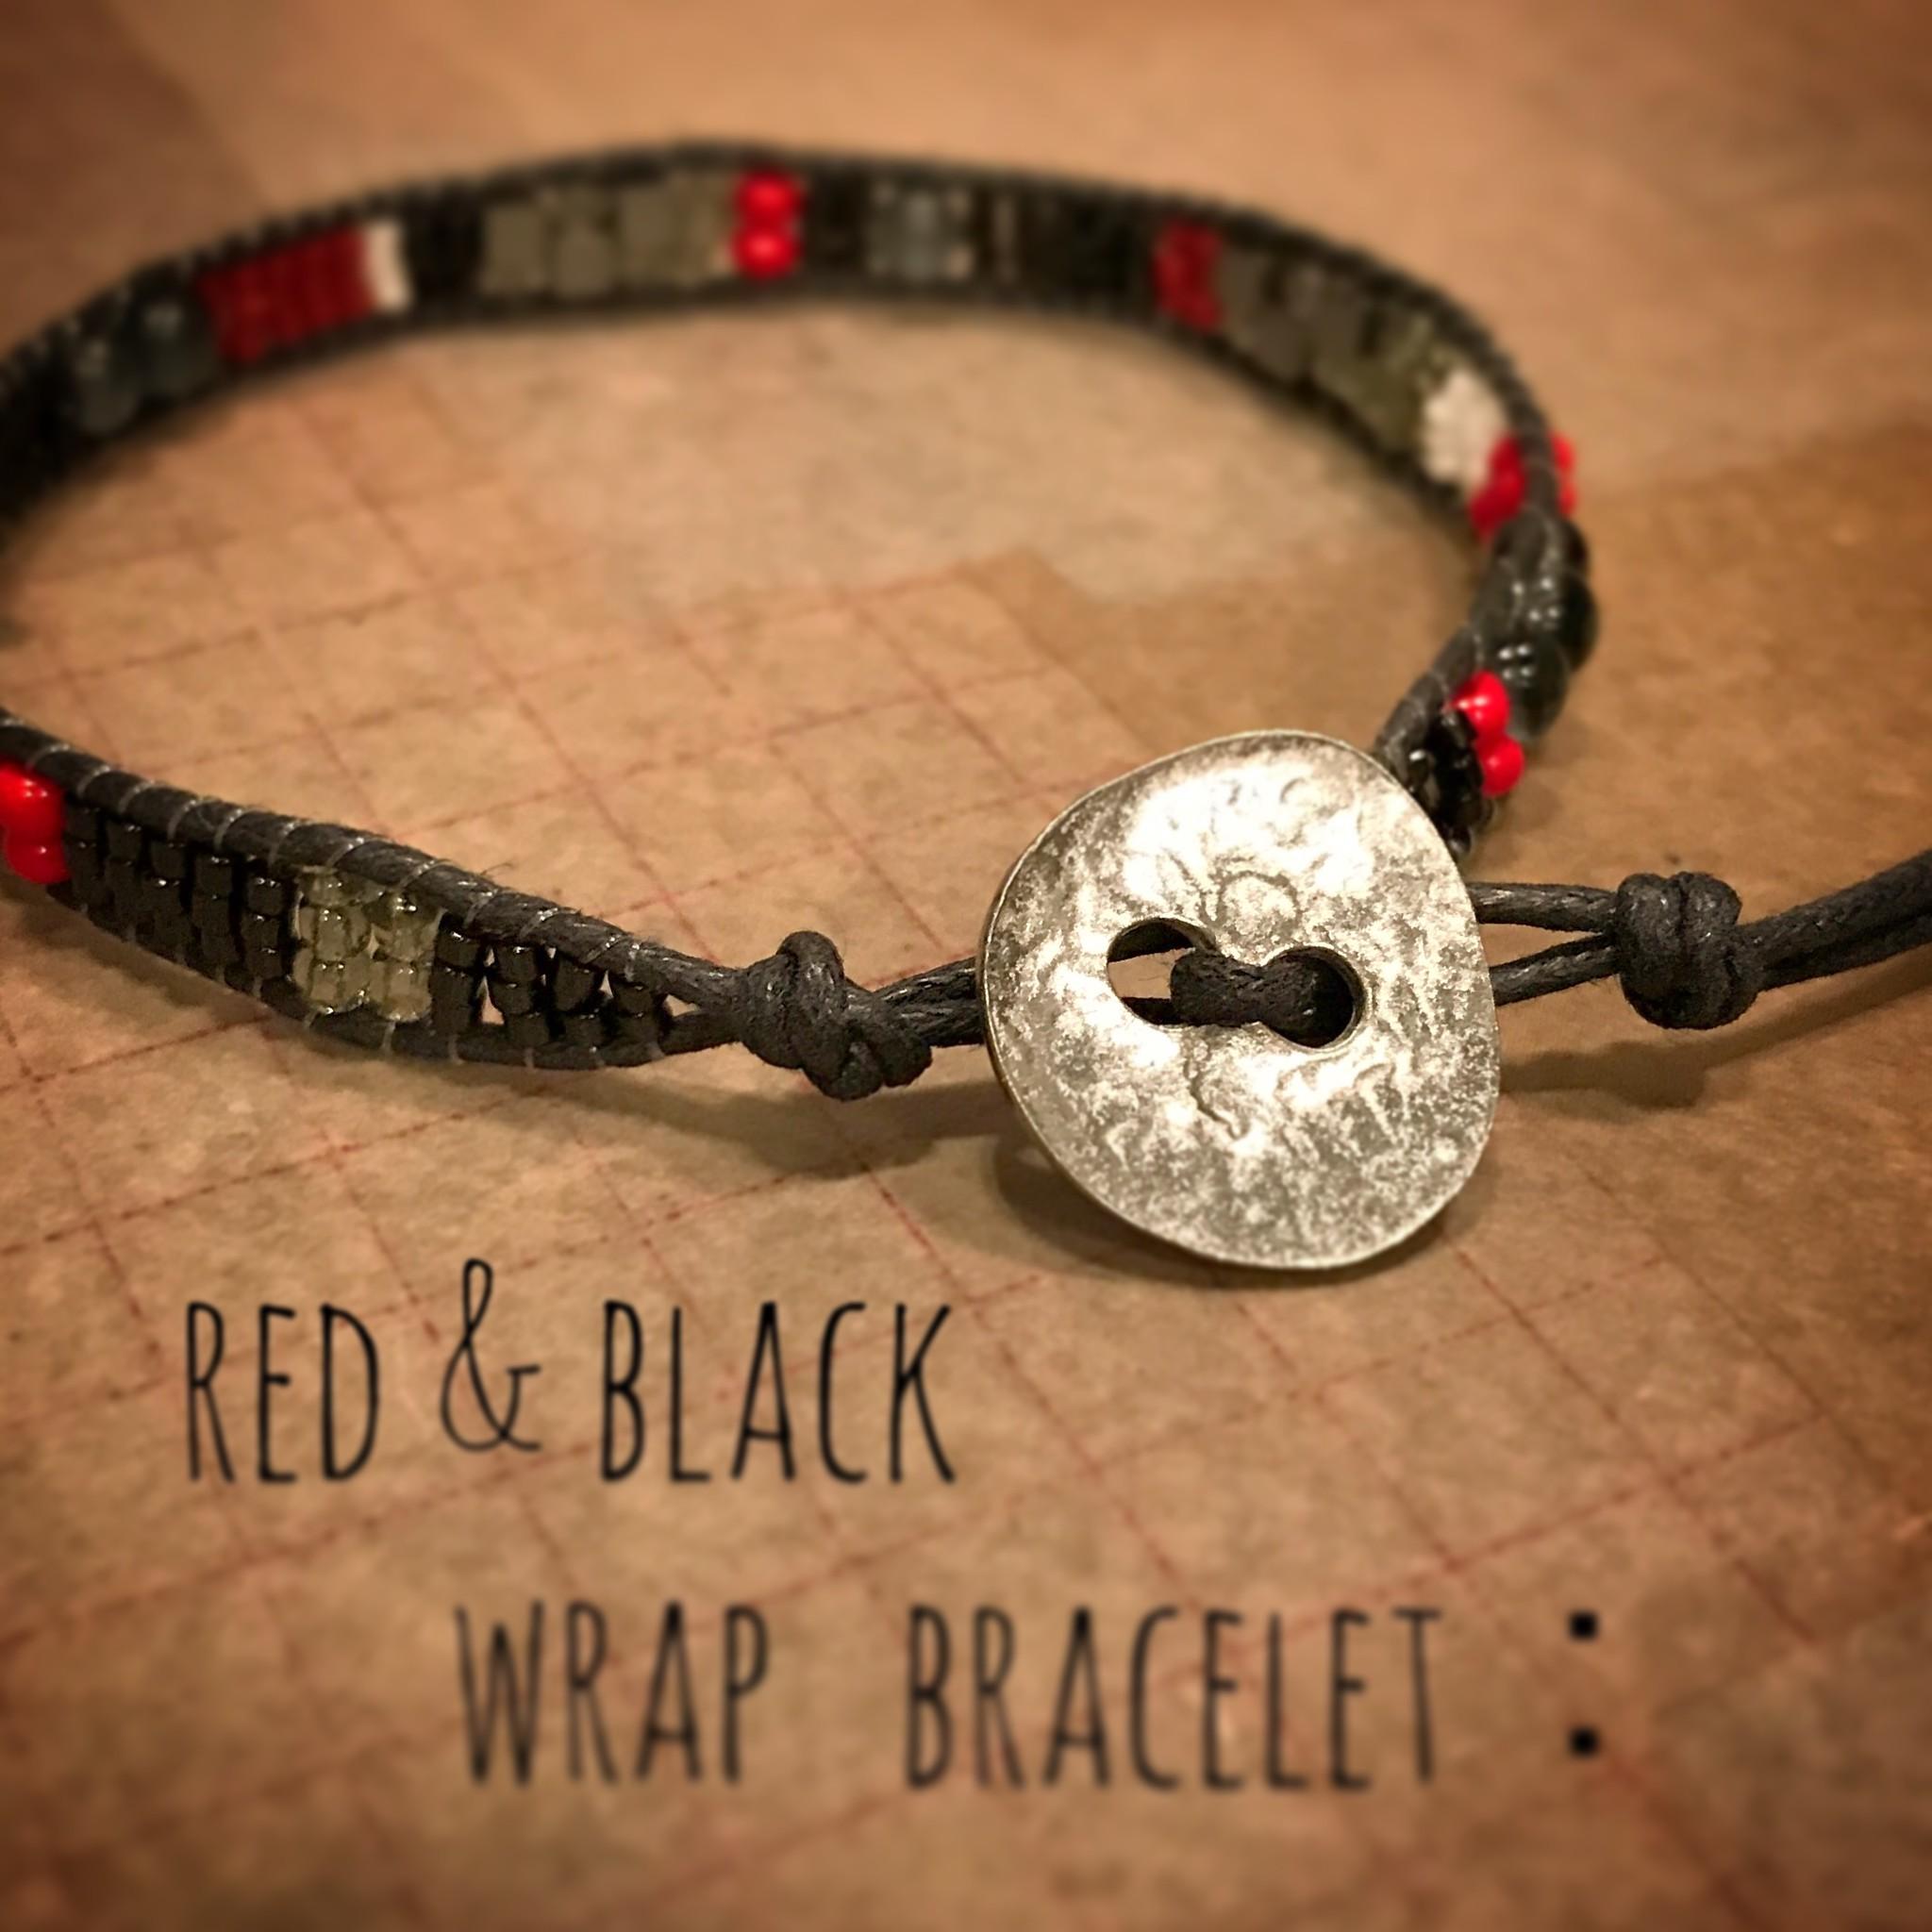 red & black wrap bracelet: